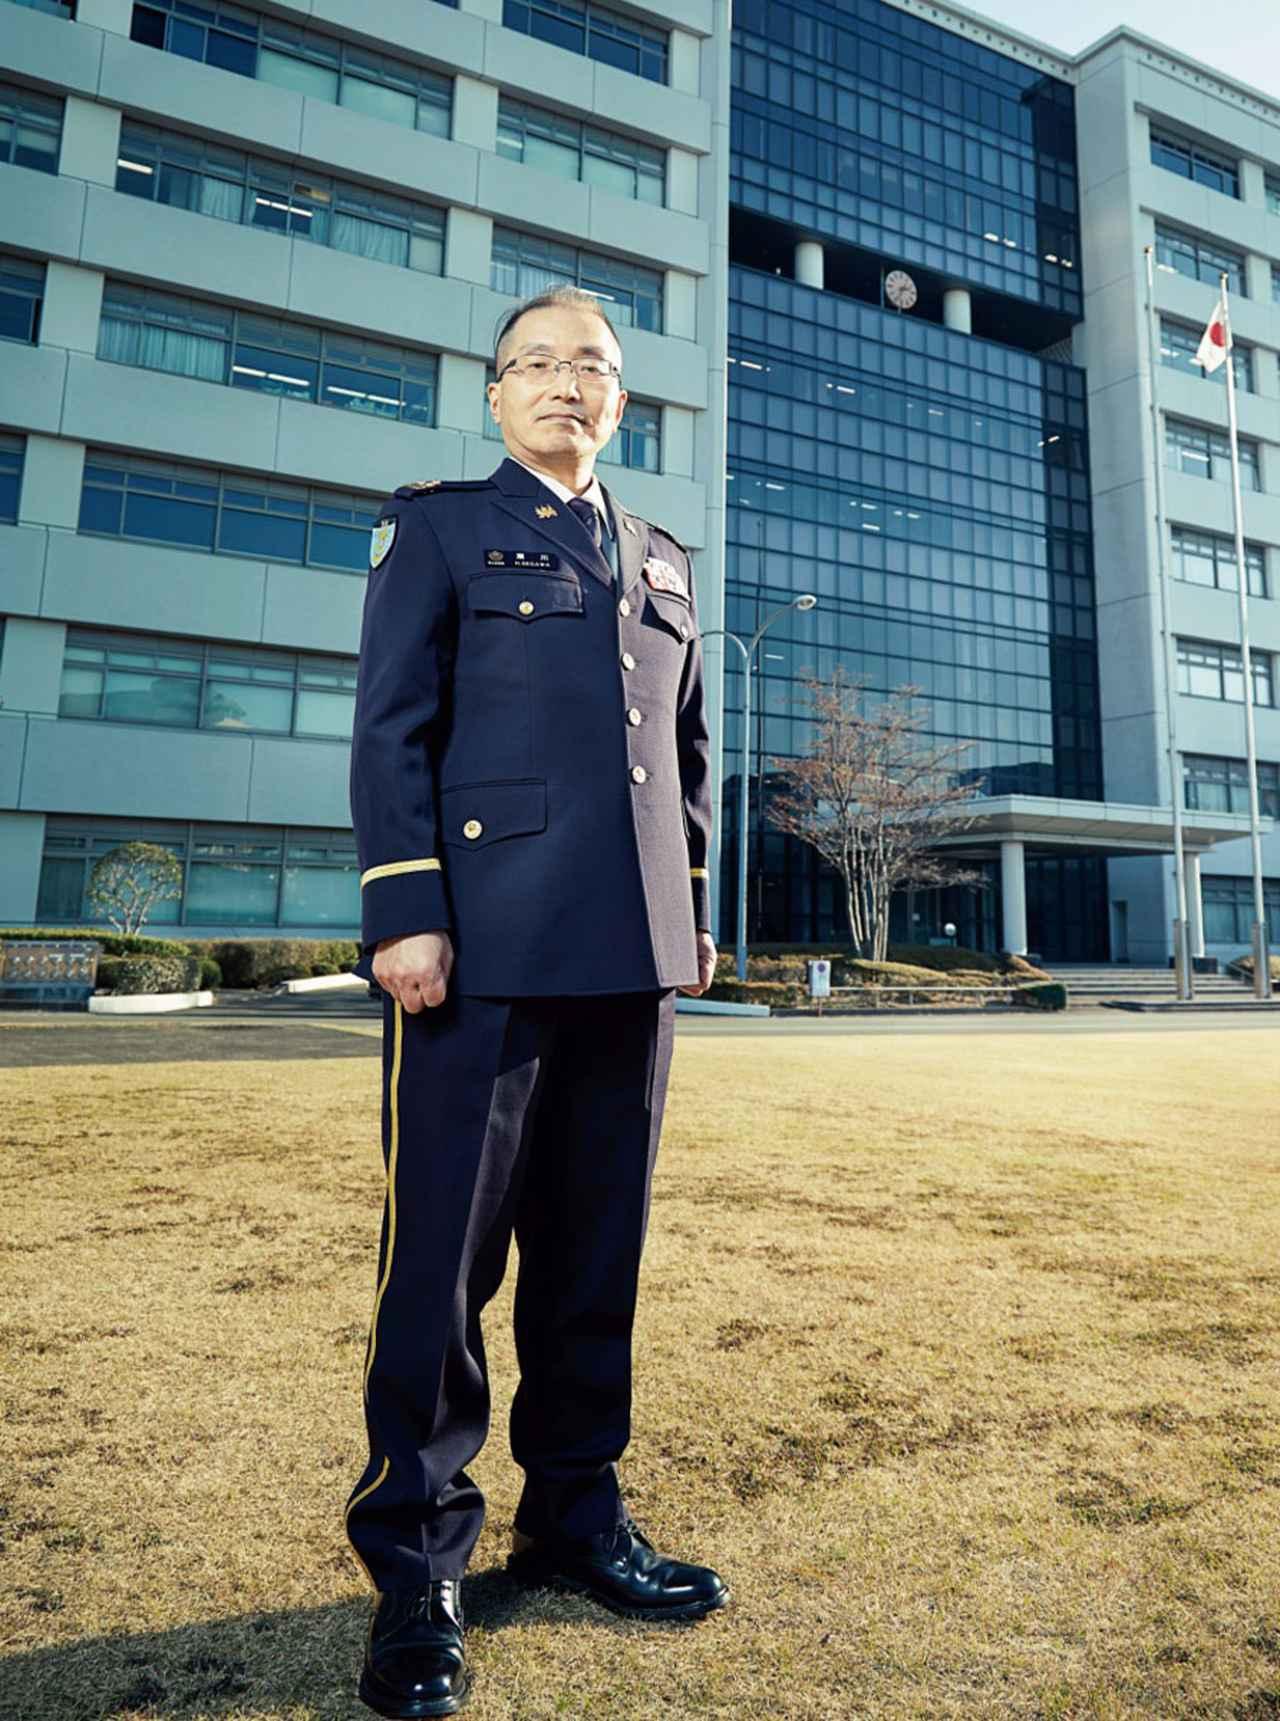 画像: 1987年入隊。情報本部、豊川駐屯地業務隊長、教育部情報教育室長を経て2020年より現職